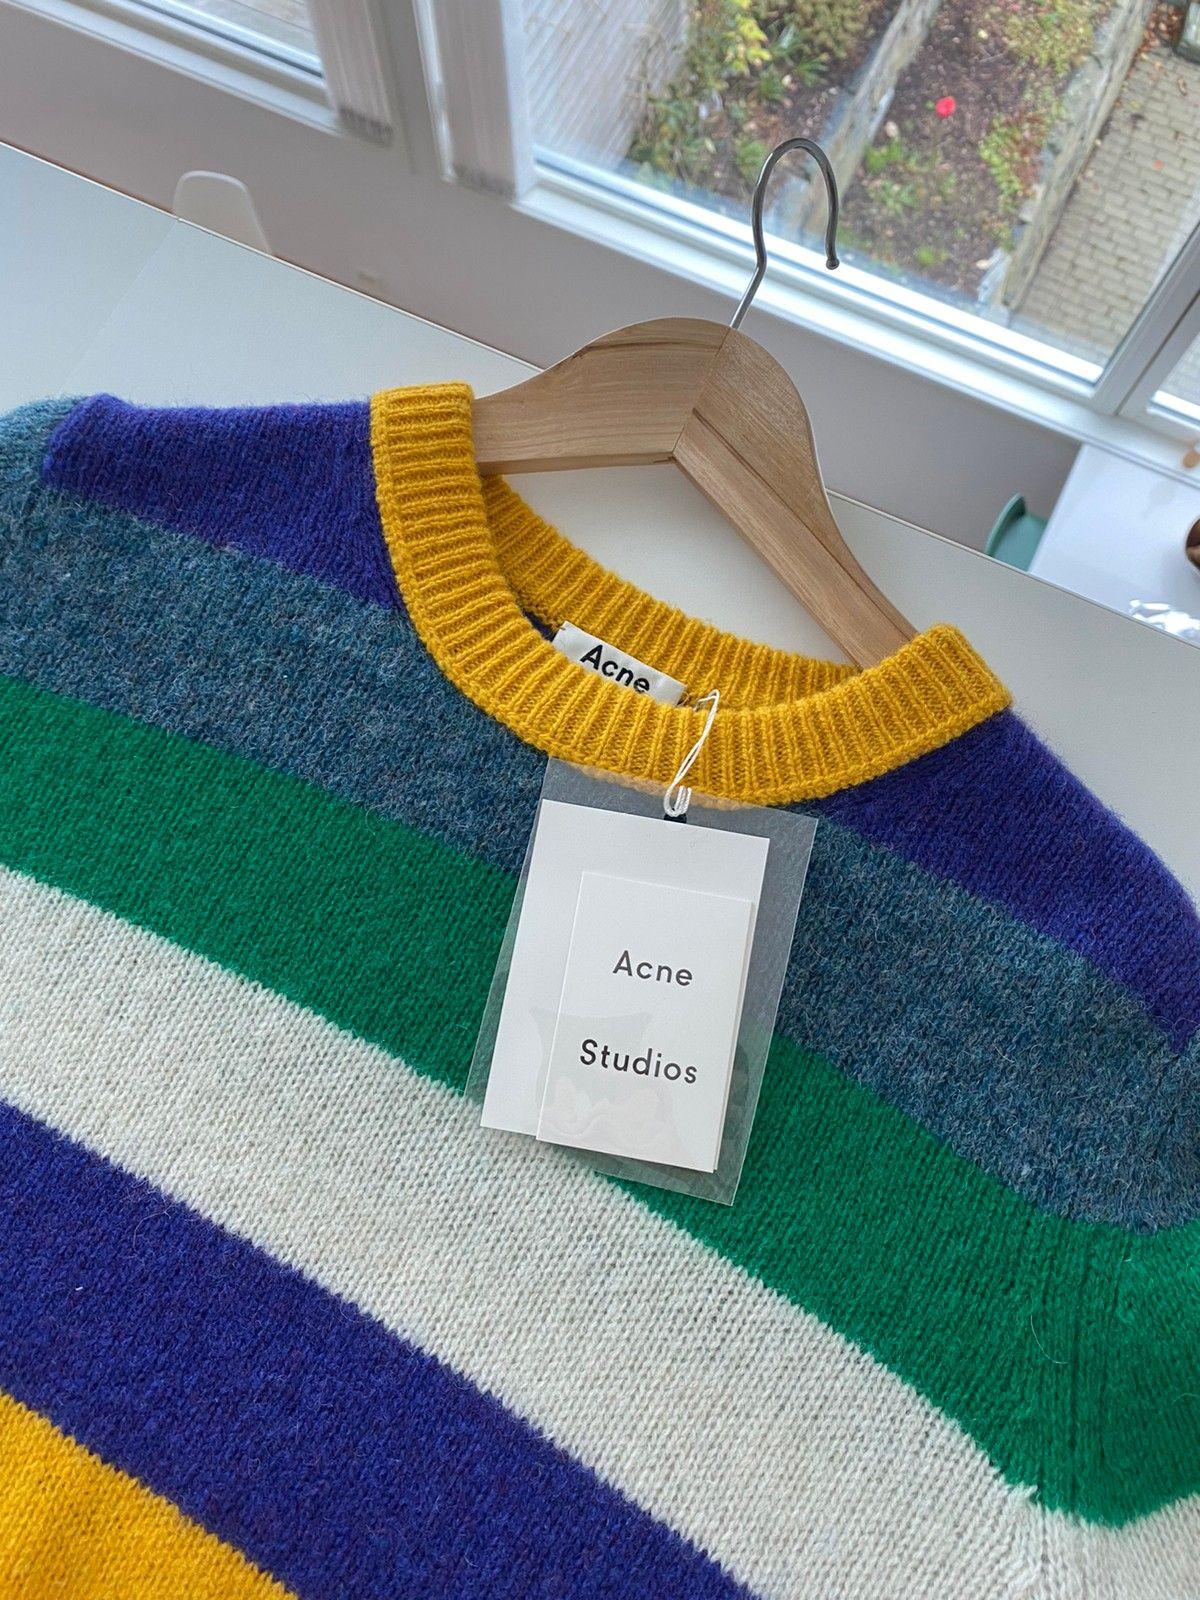 Acne studios genser | FINN.no